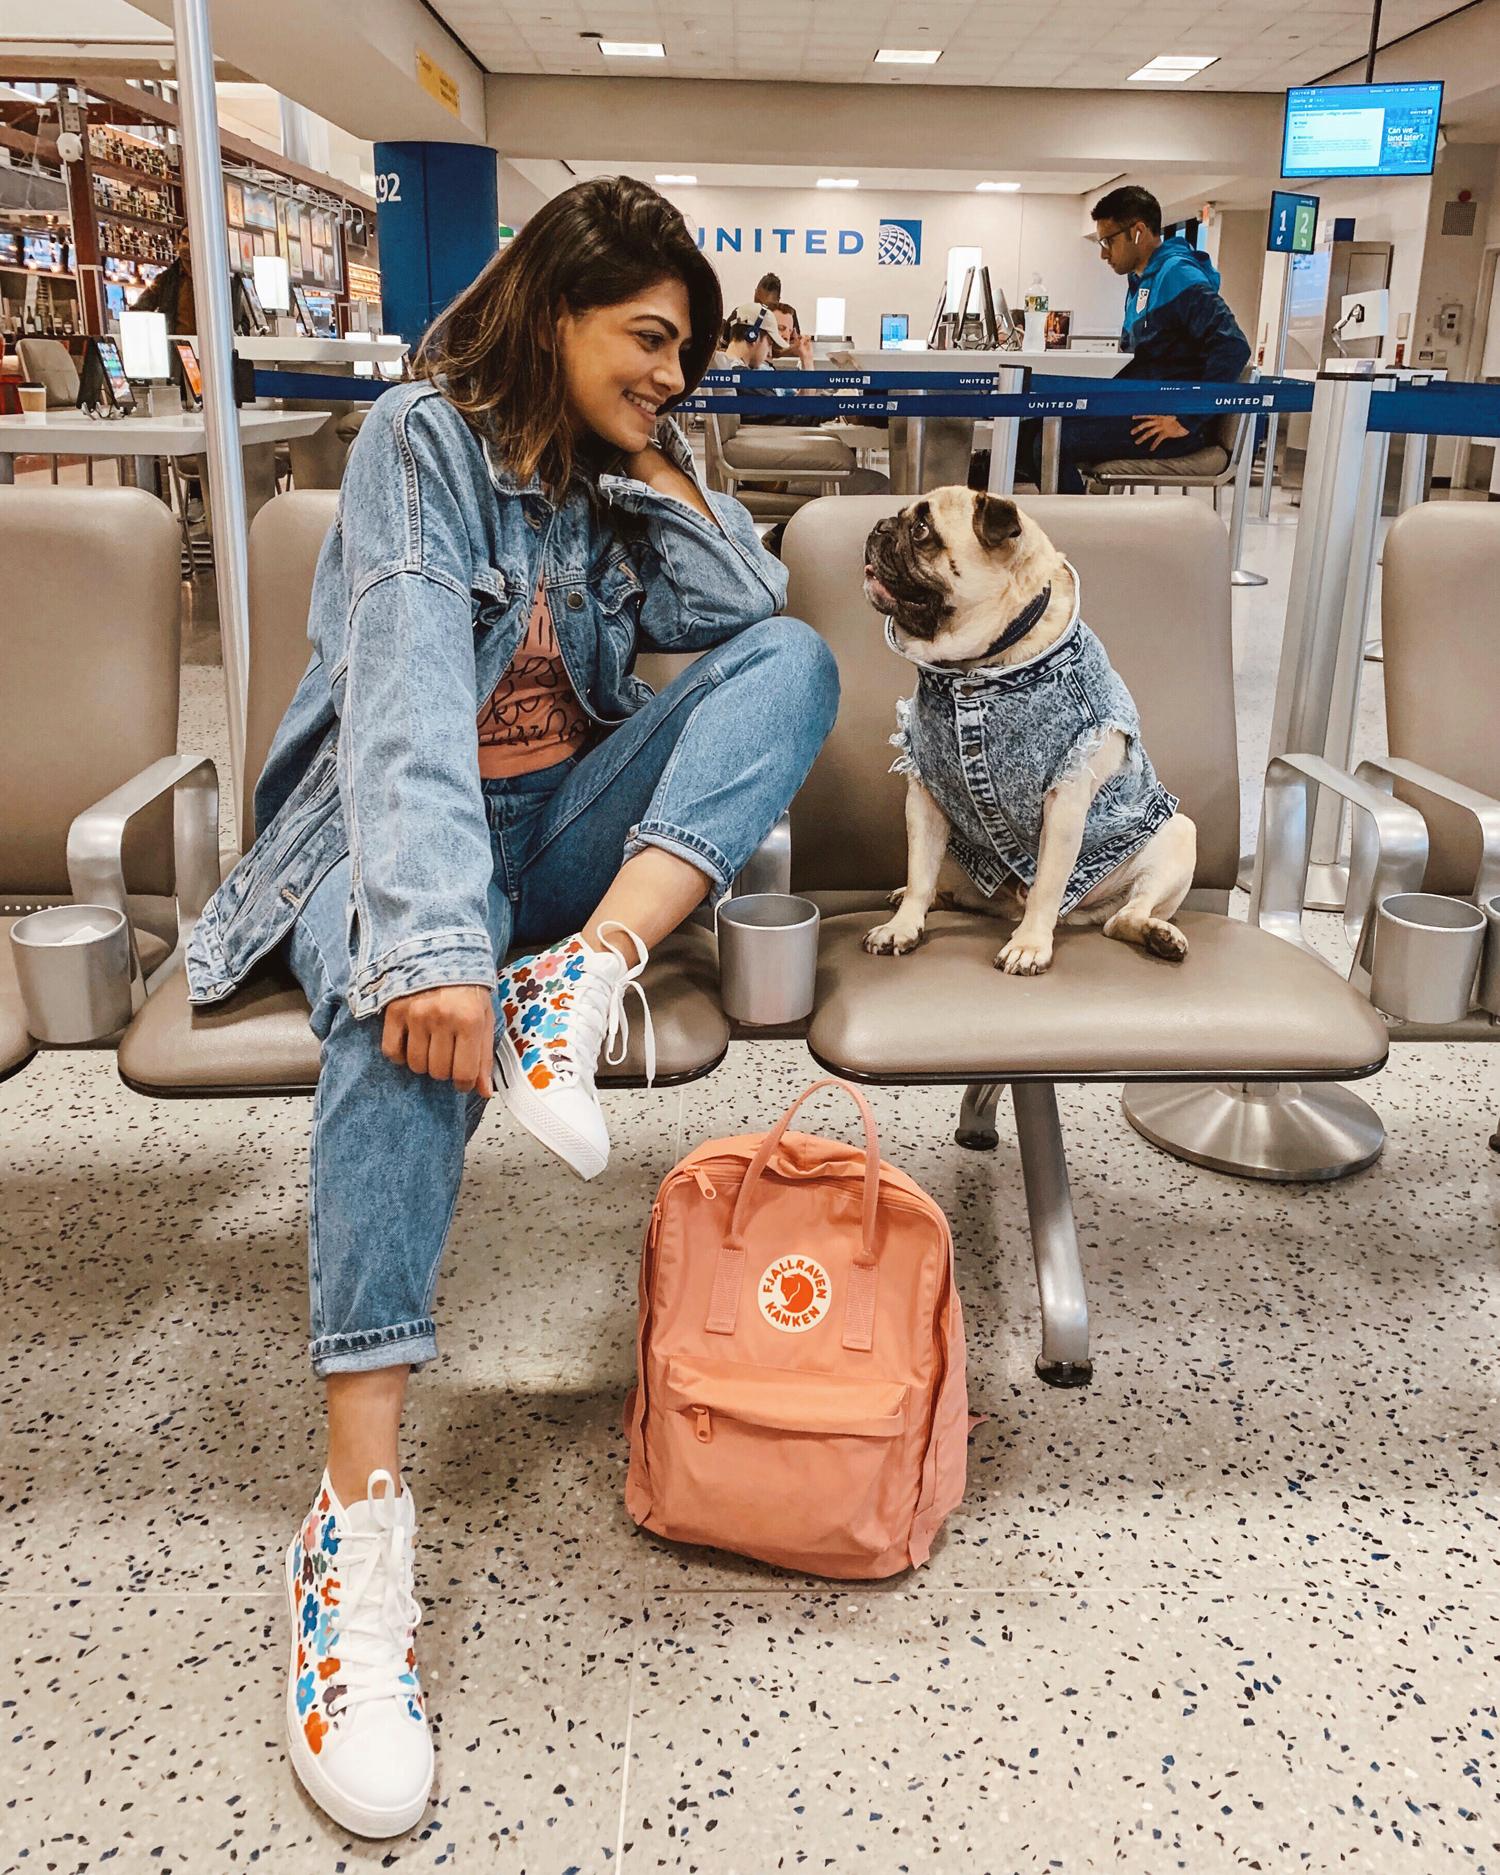 international-travel-with-dog-paris-uk-from-us-dogfriendly-travel 3.jpg